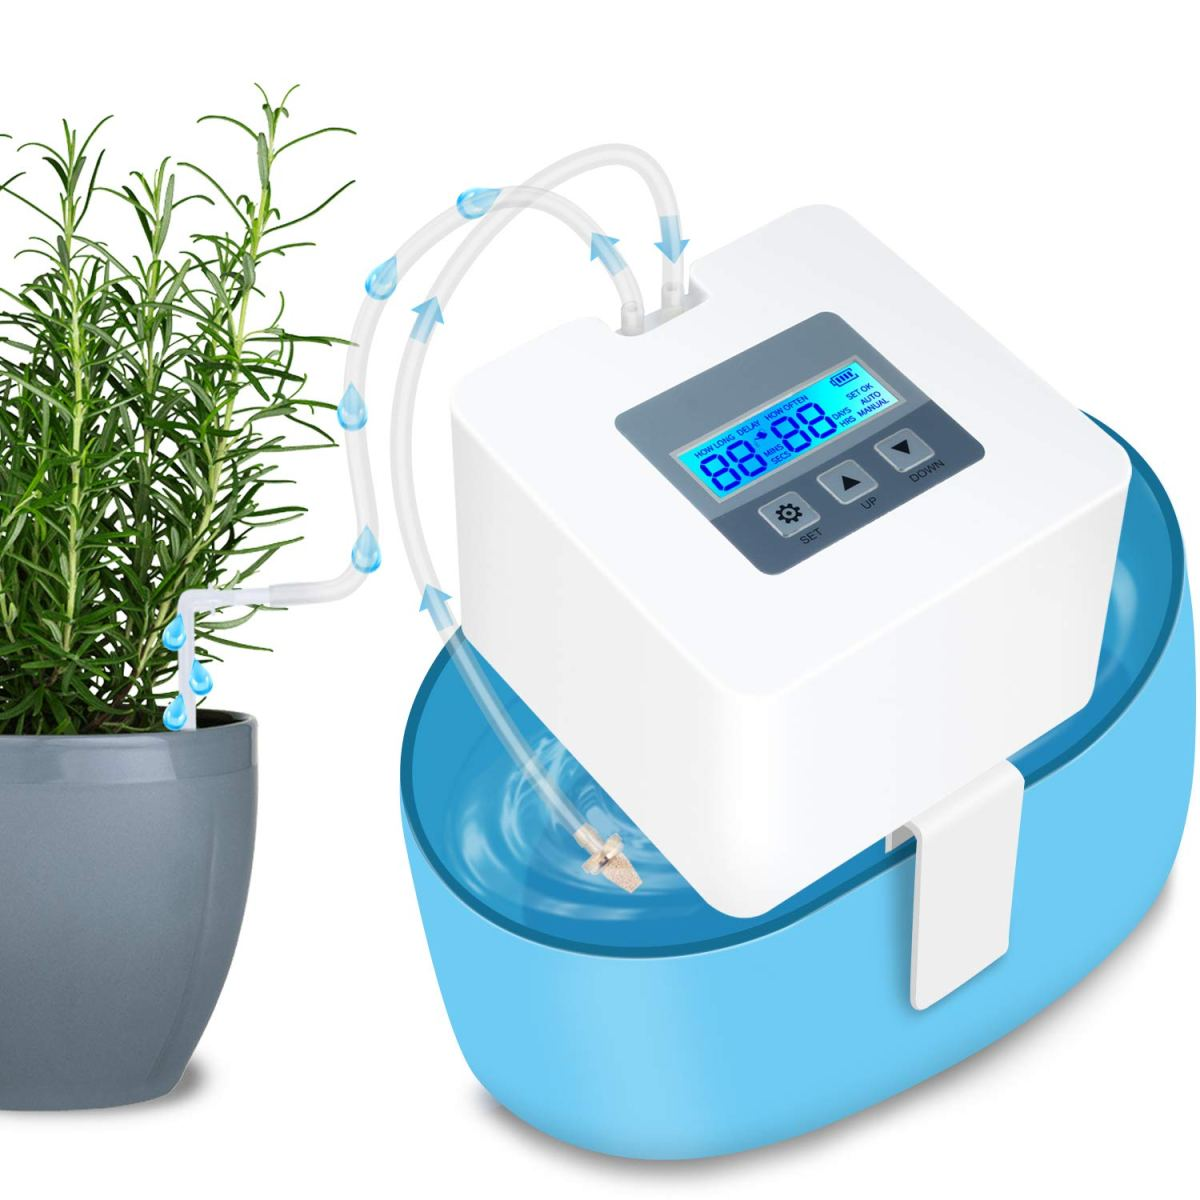 Inteligente sistema de riego para plantas: